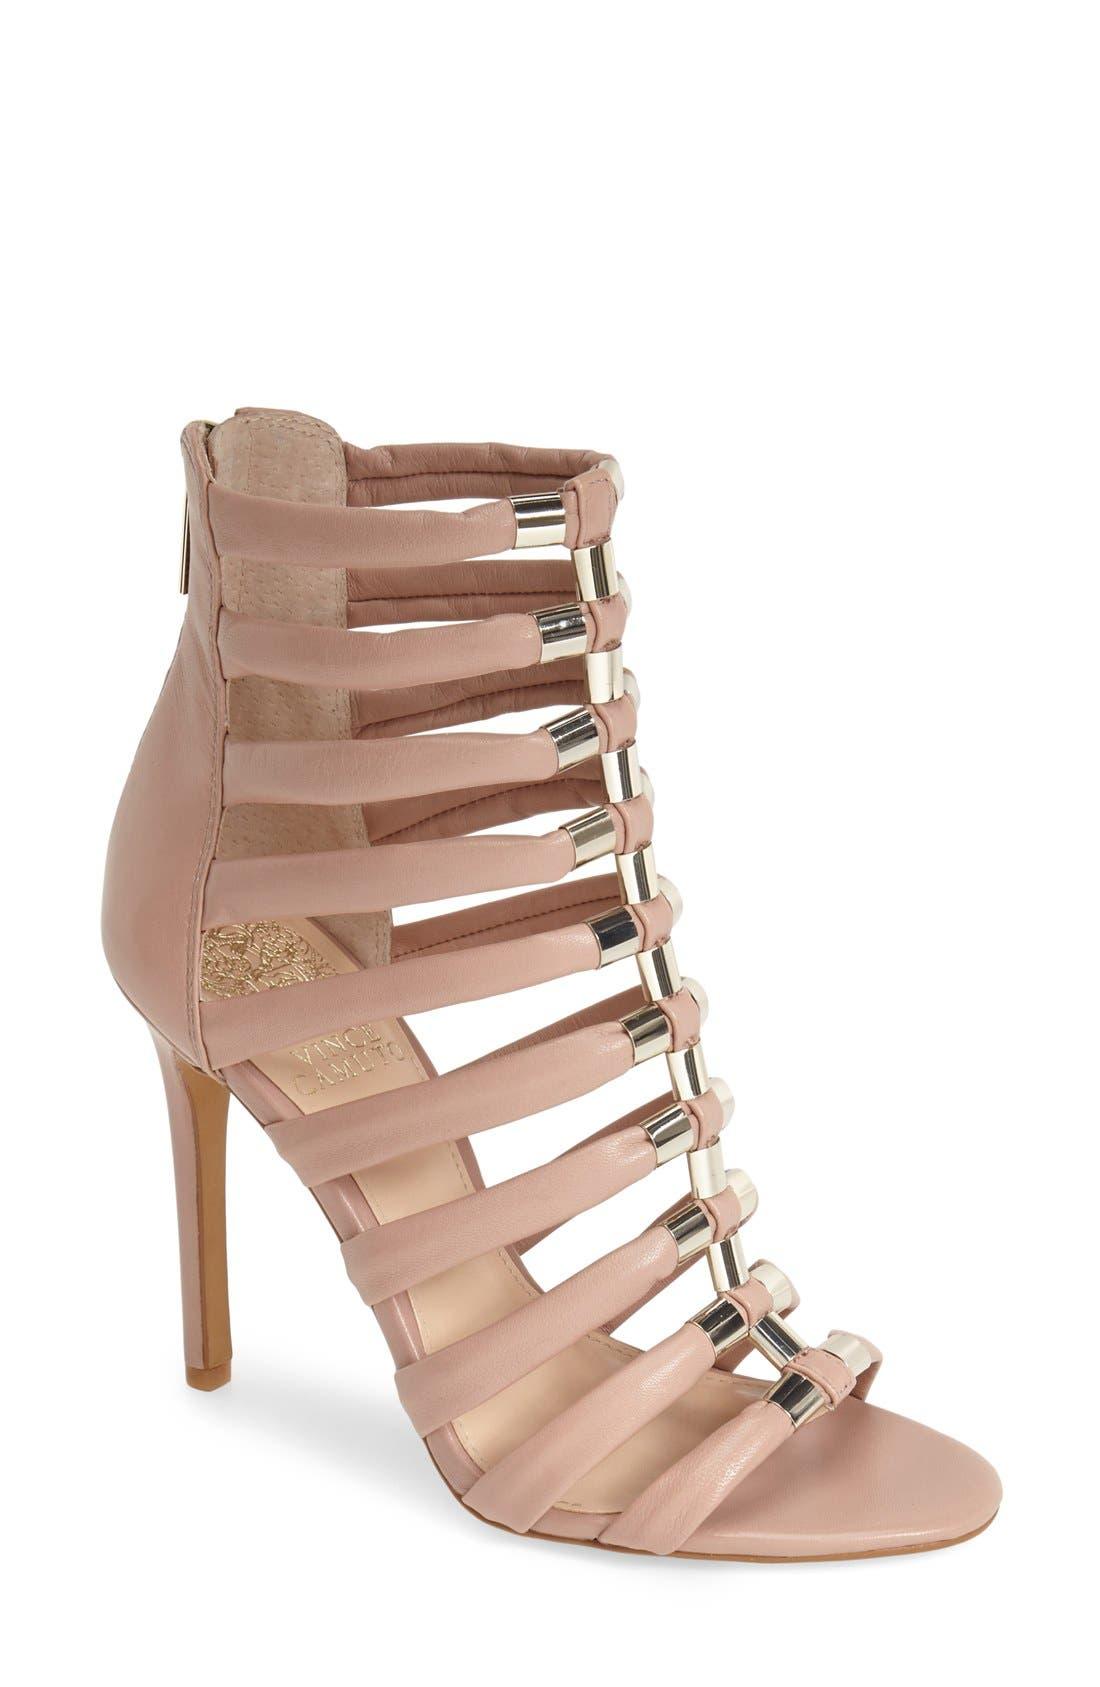 Alternate Image 1 Selected - Vince Camuto 'Troy' Gladiator Sandal (Women)